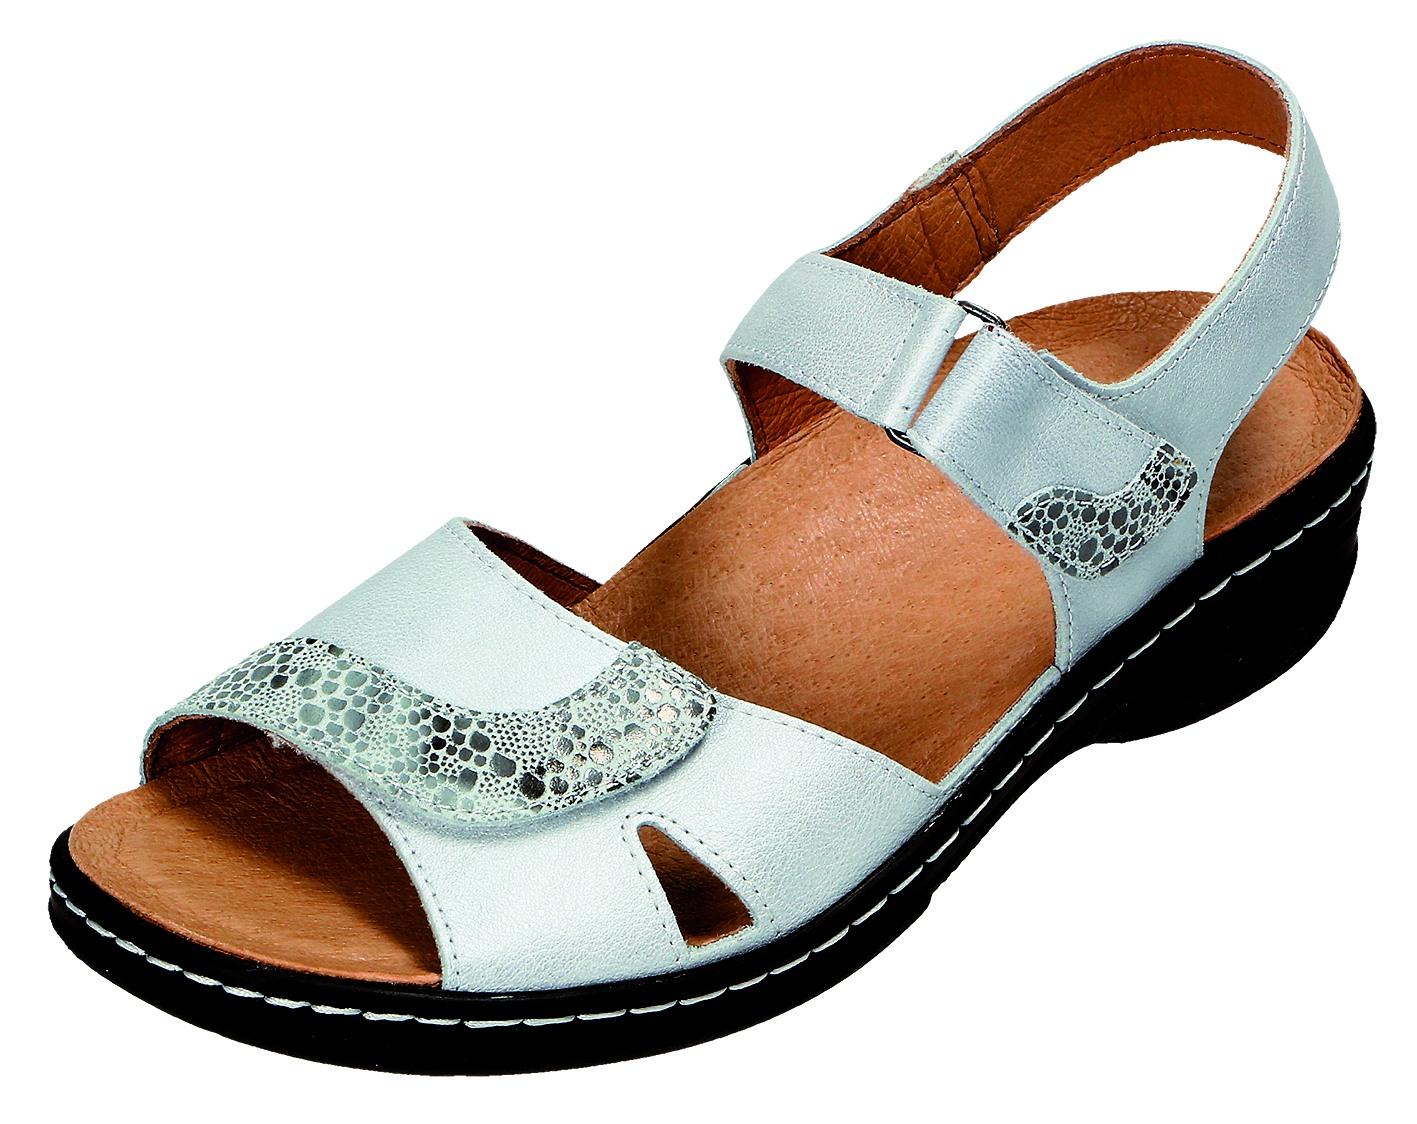 DocComfort Damen Sandale-Pantol.bequem D.Sandaleette Grau 31.005 ROHWEISS